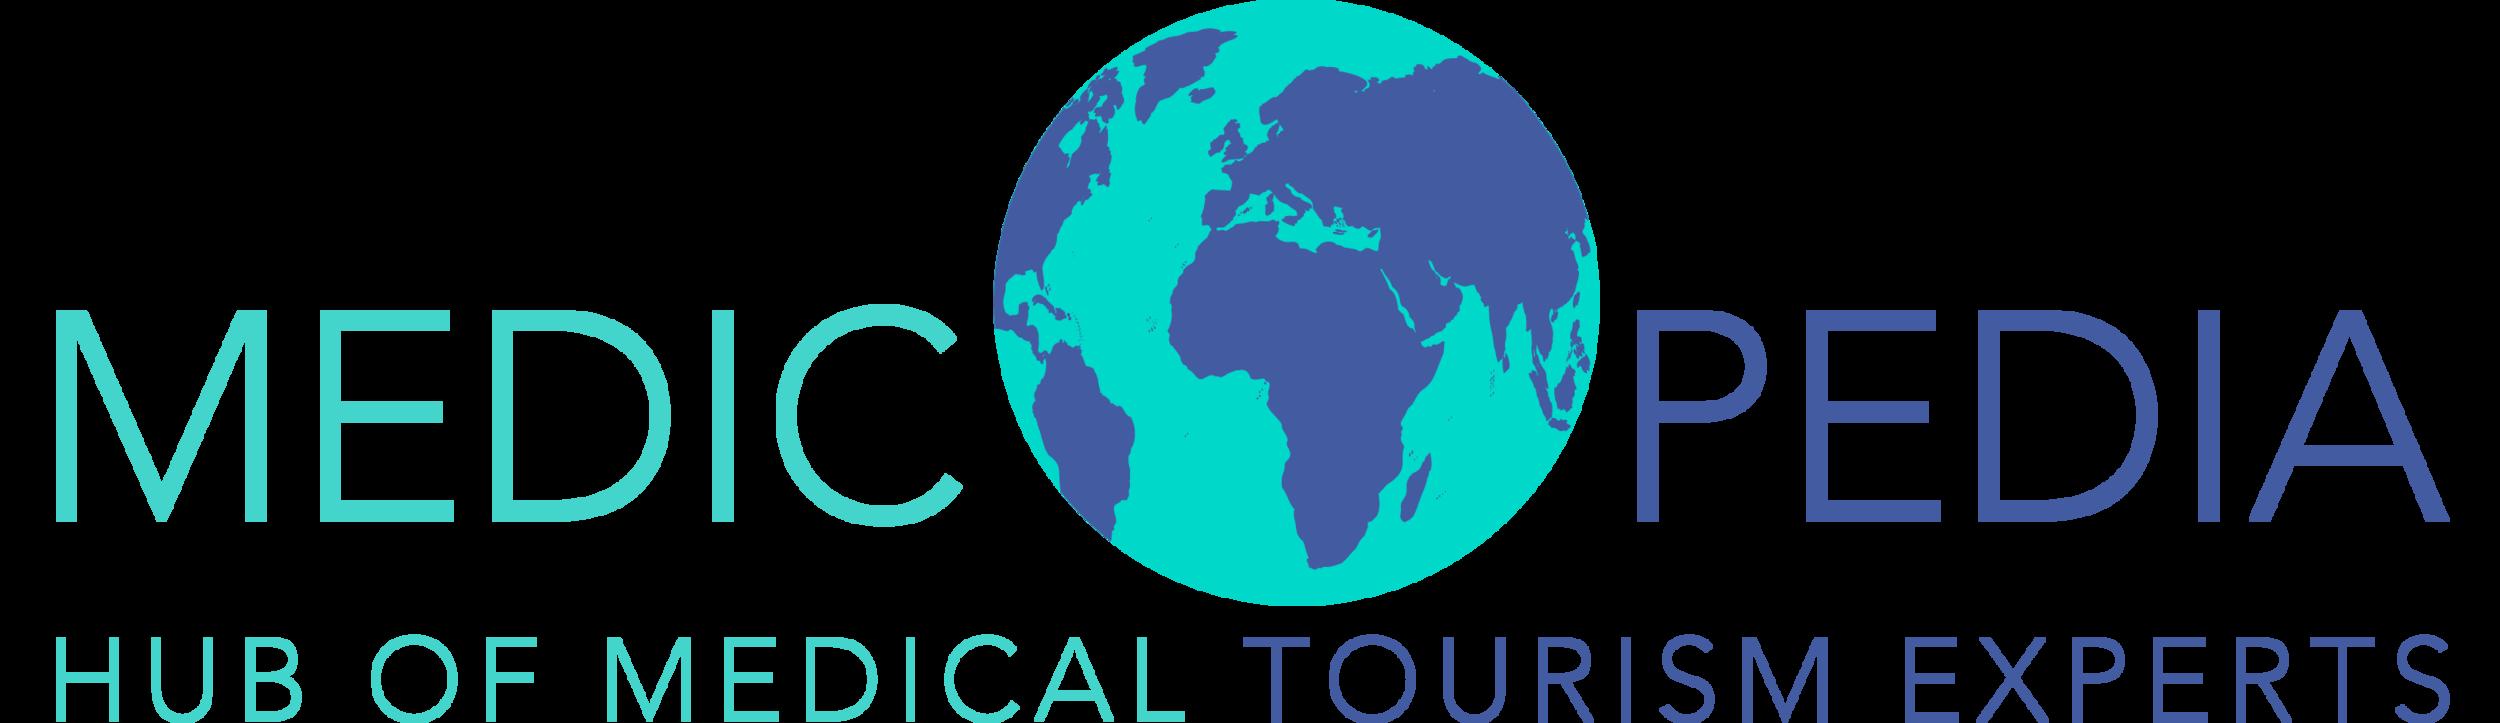 MEDICO PEDIA Logo_New-02.png